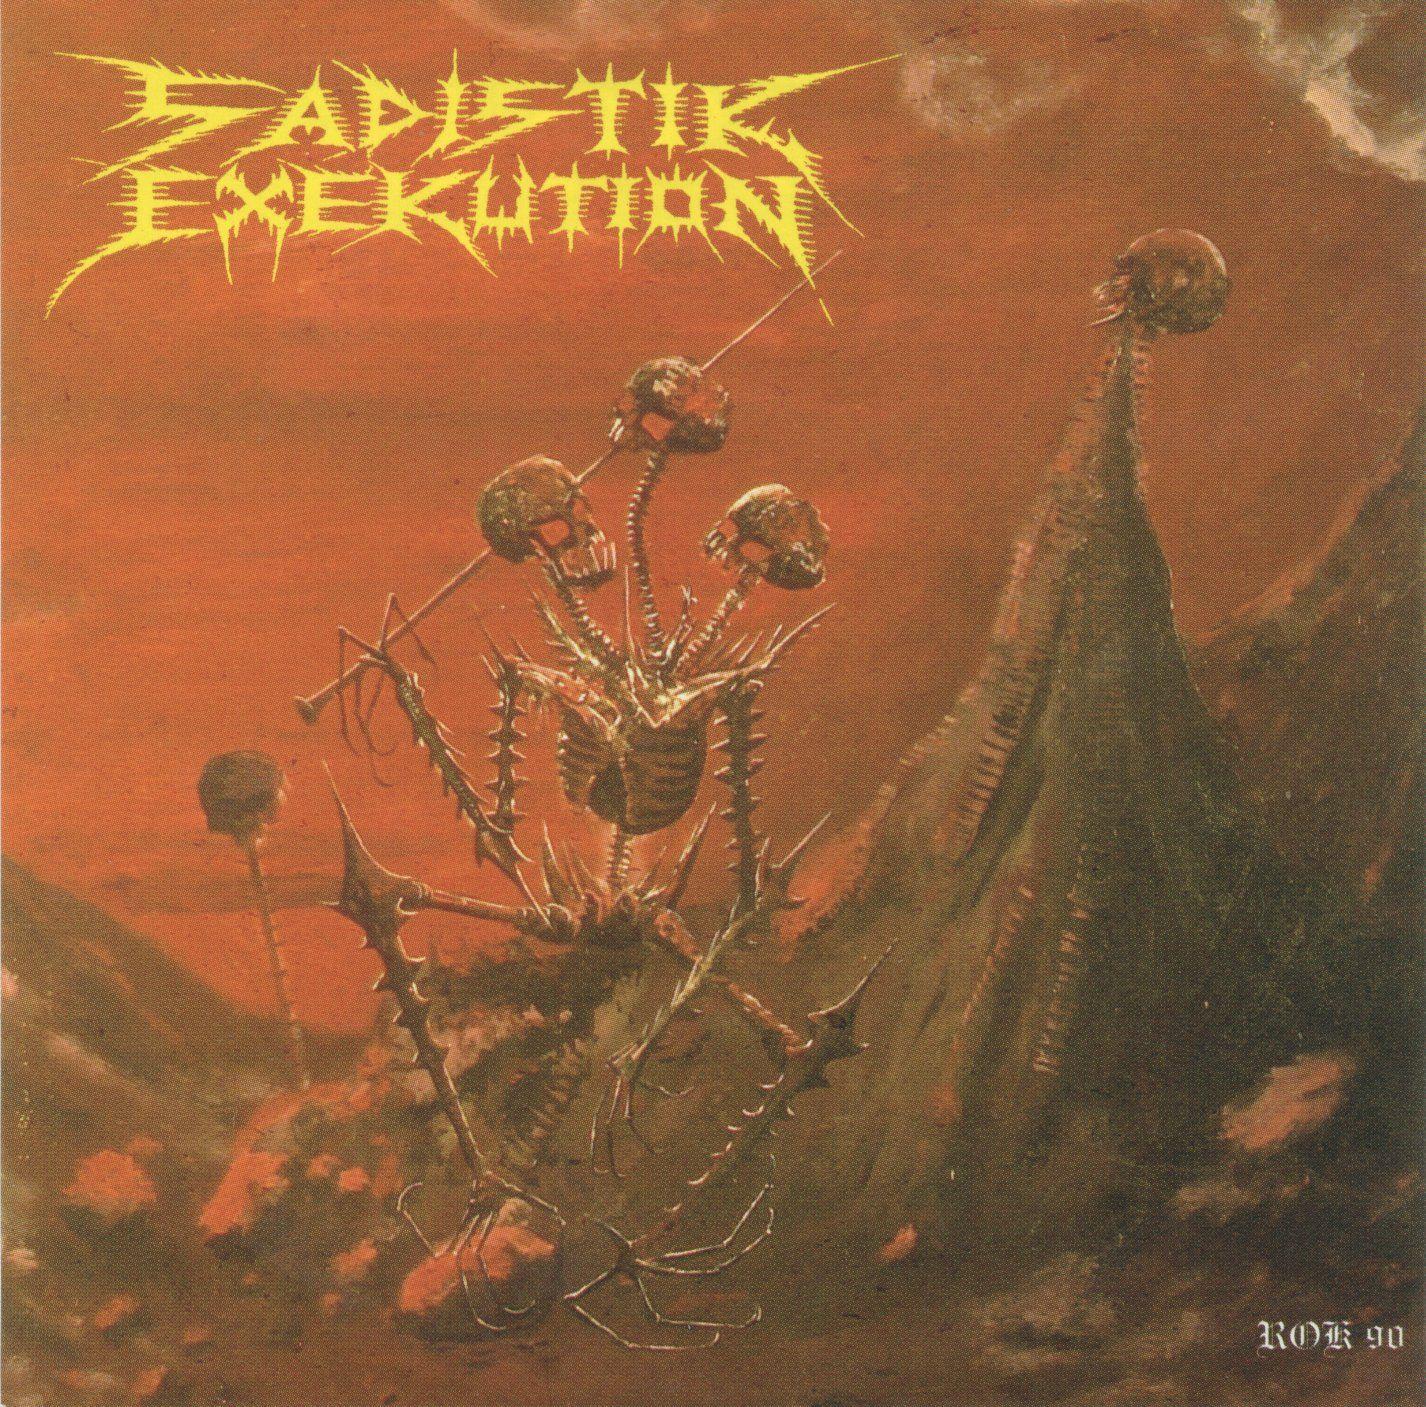 Sadistik Exekution - We are Death... Fukk you!